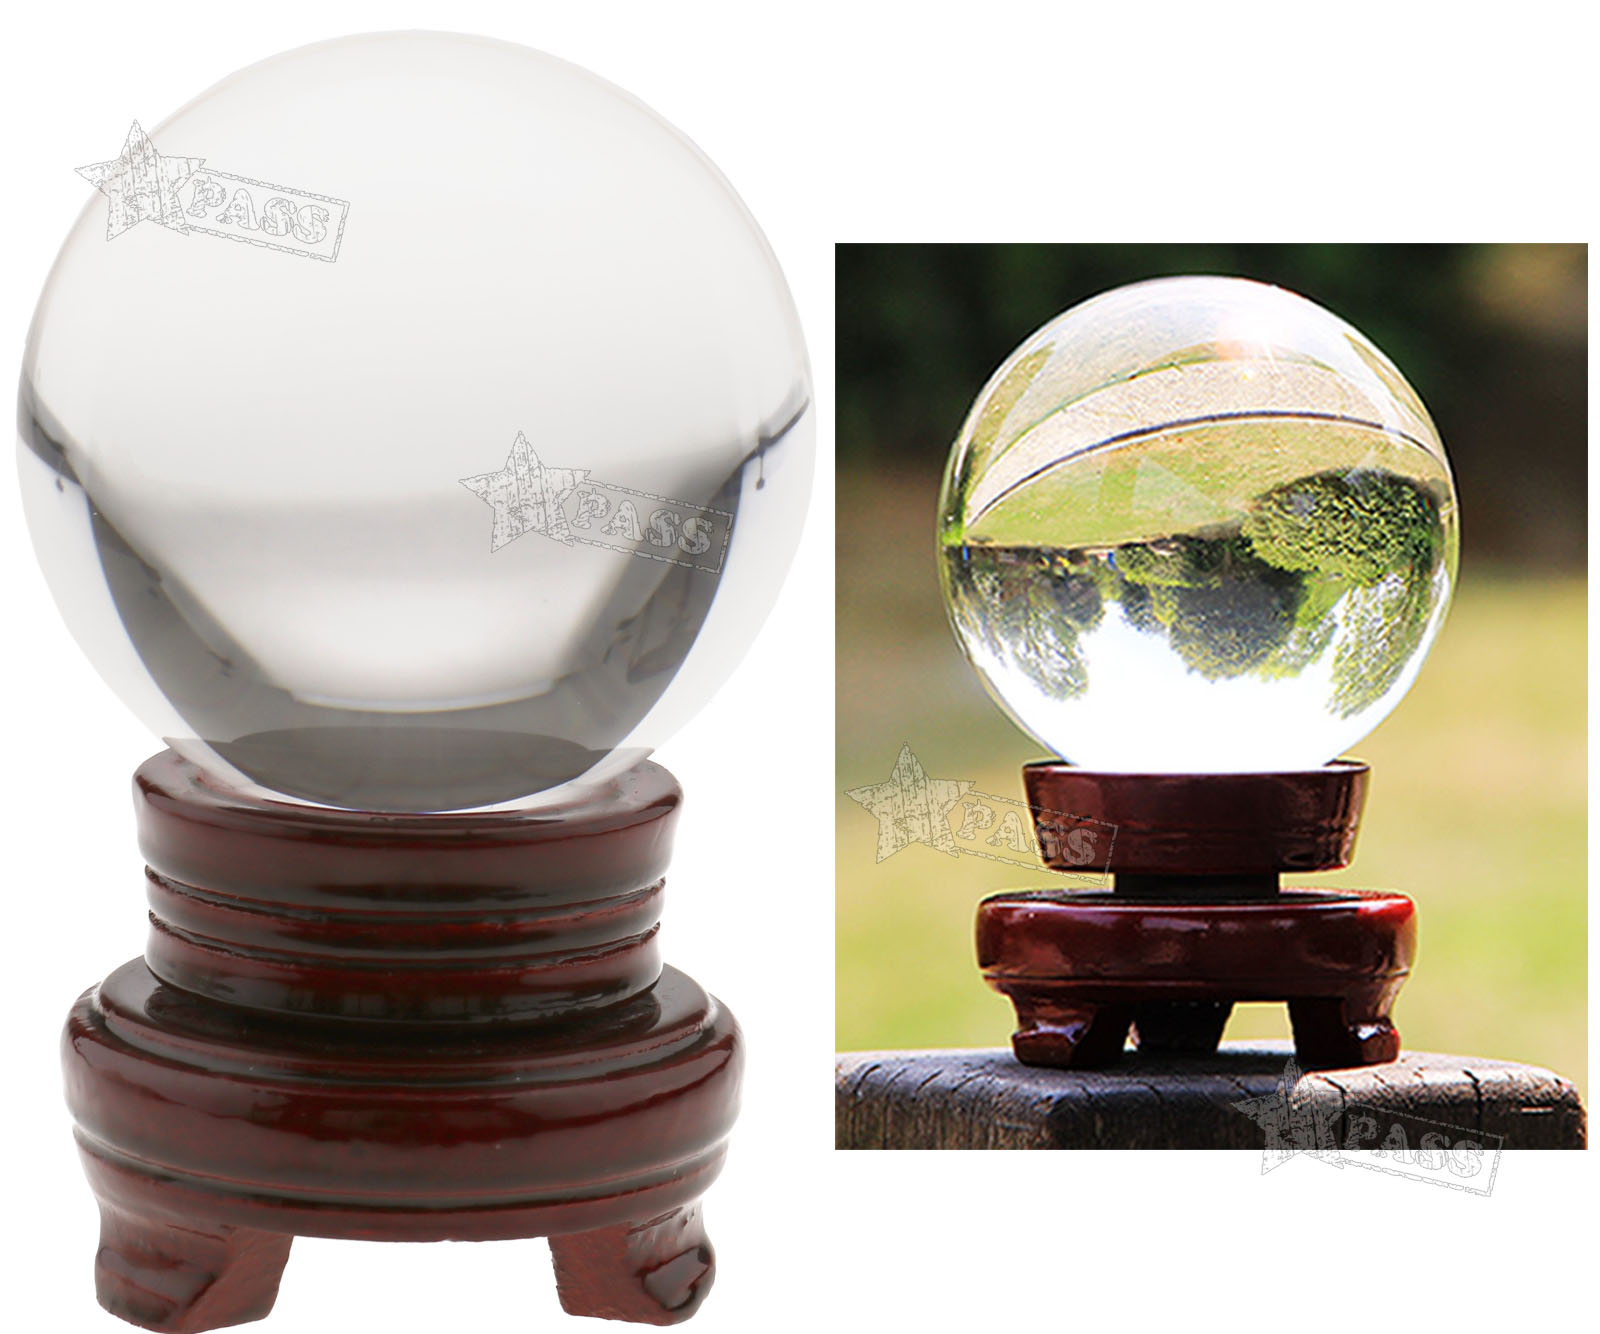 Mm clear glass crystal ball magic healing meditate